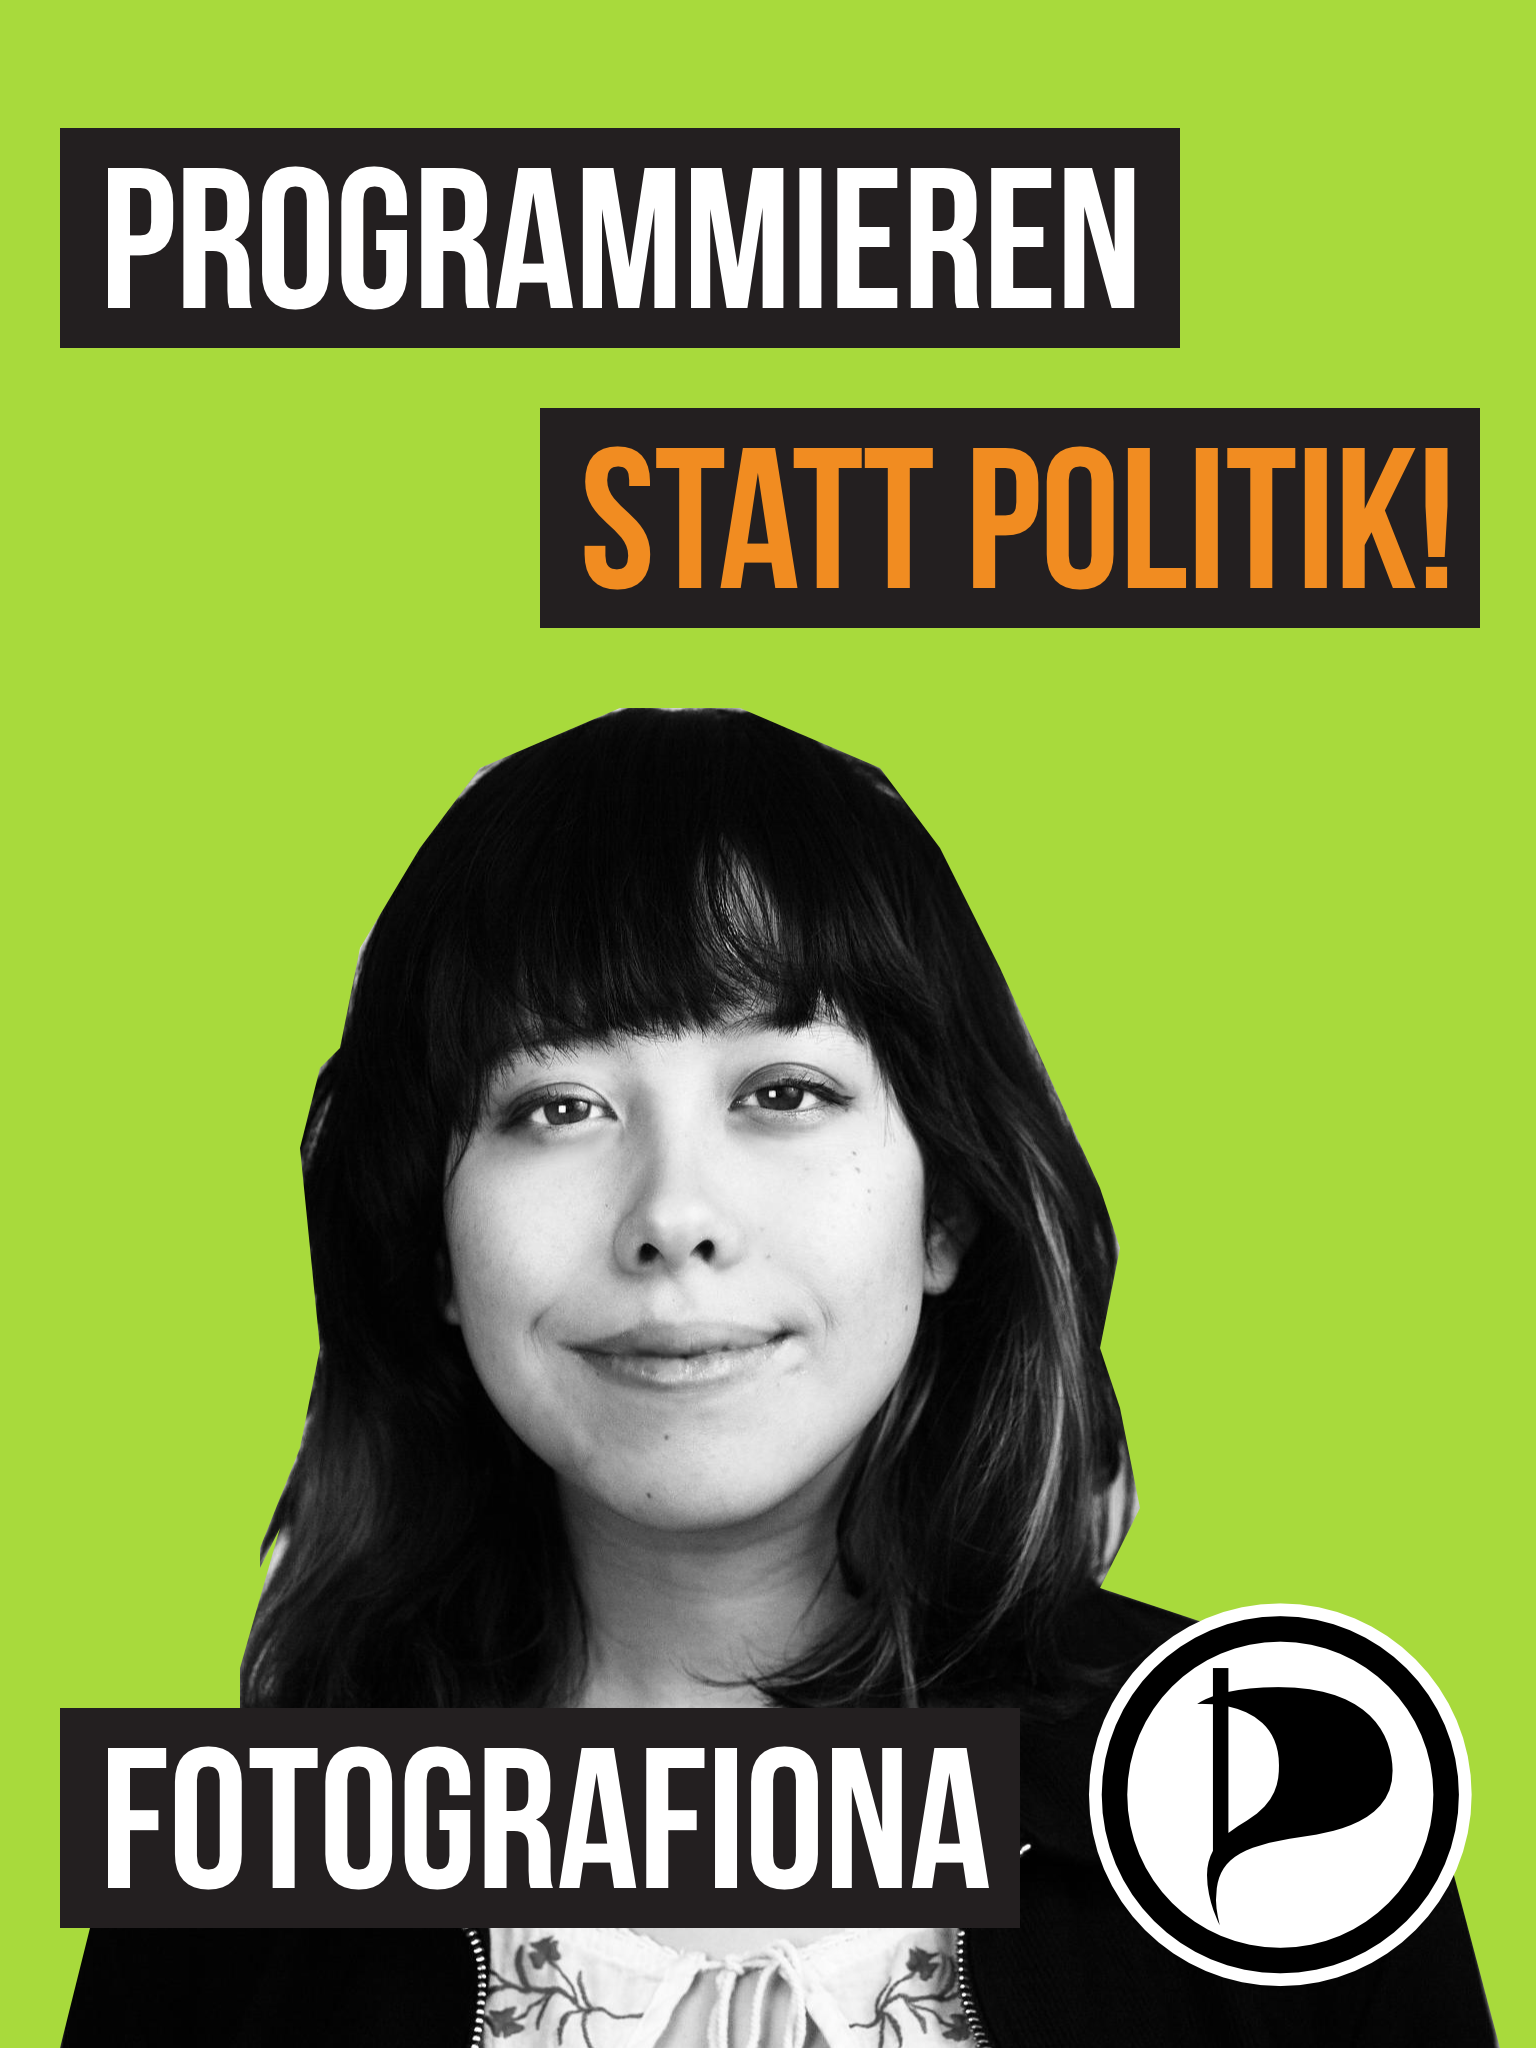 Programmieren statt Politik! Fotografiona